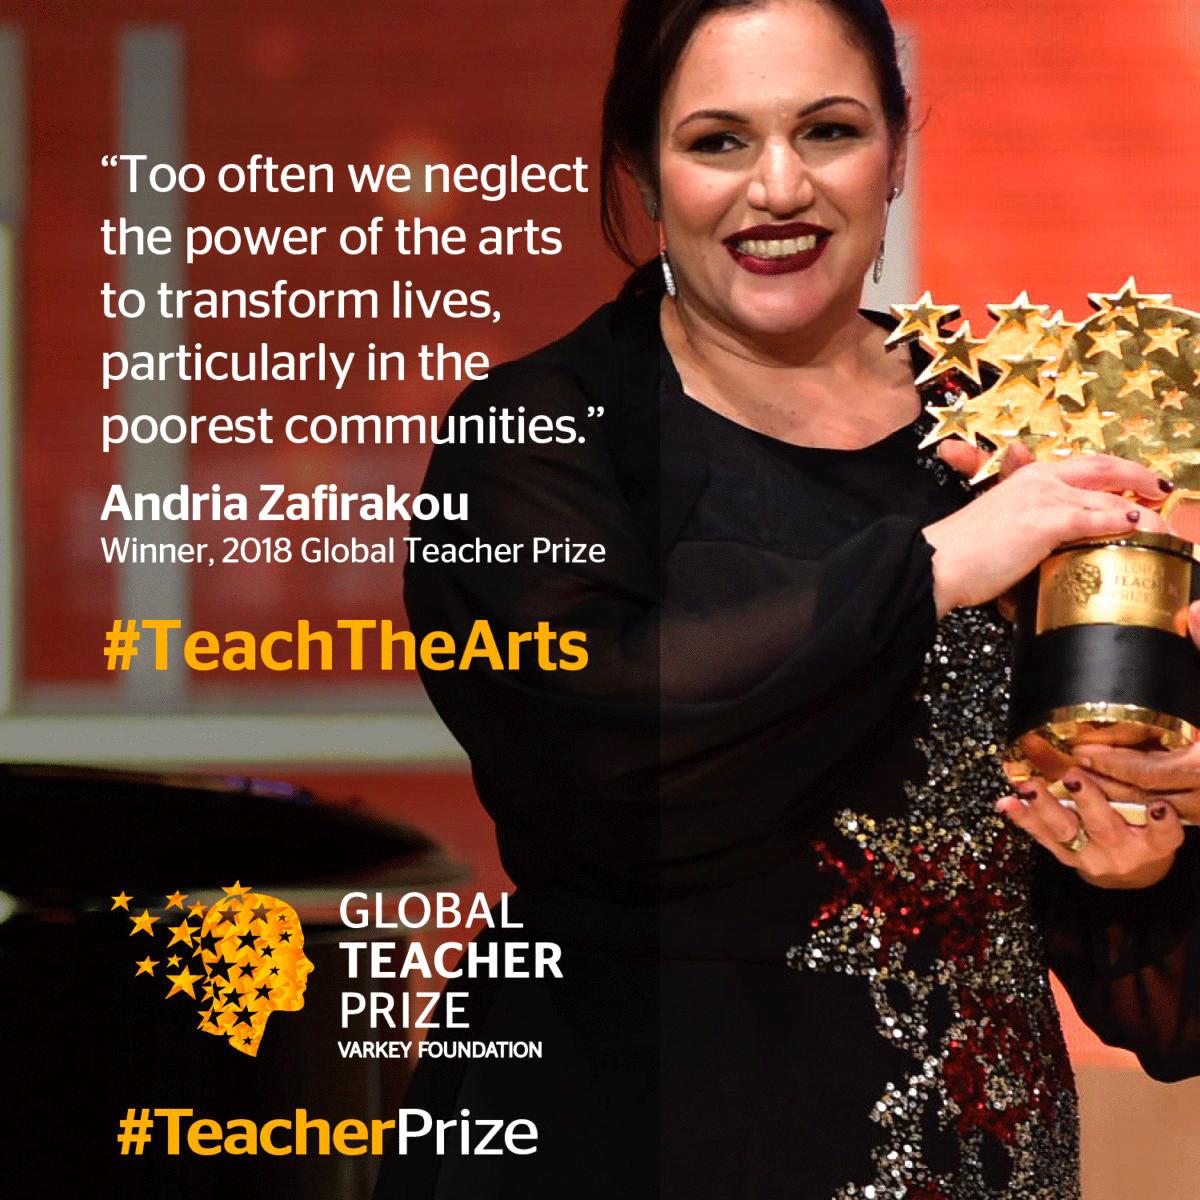 Andria Zafirakou from Alperton Community School in the UK won the 2018 Global Teacher Prize image-credit-The-Varkey-Foundation